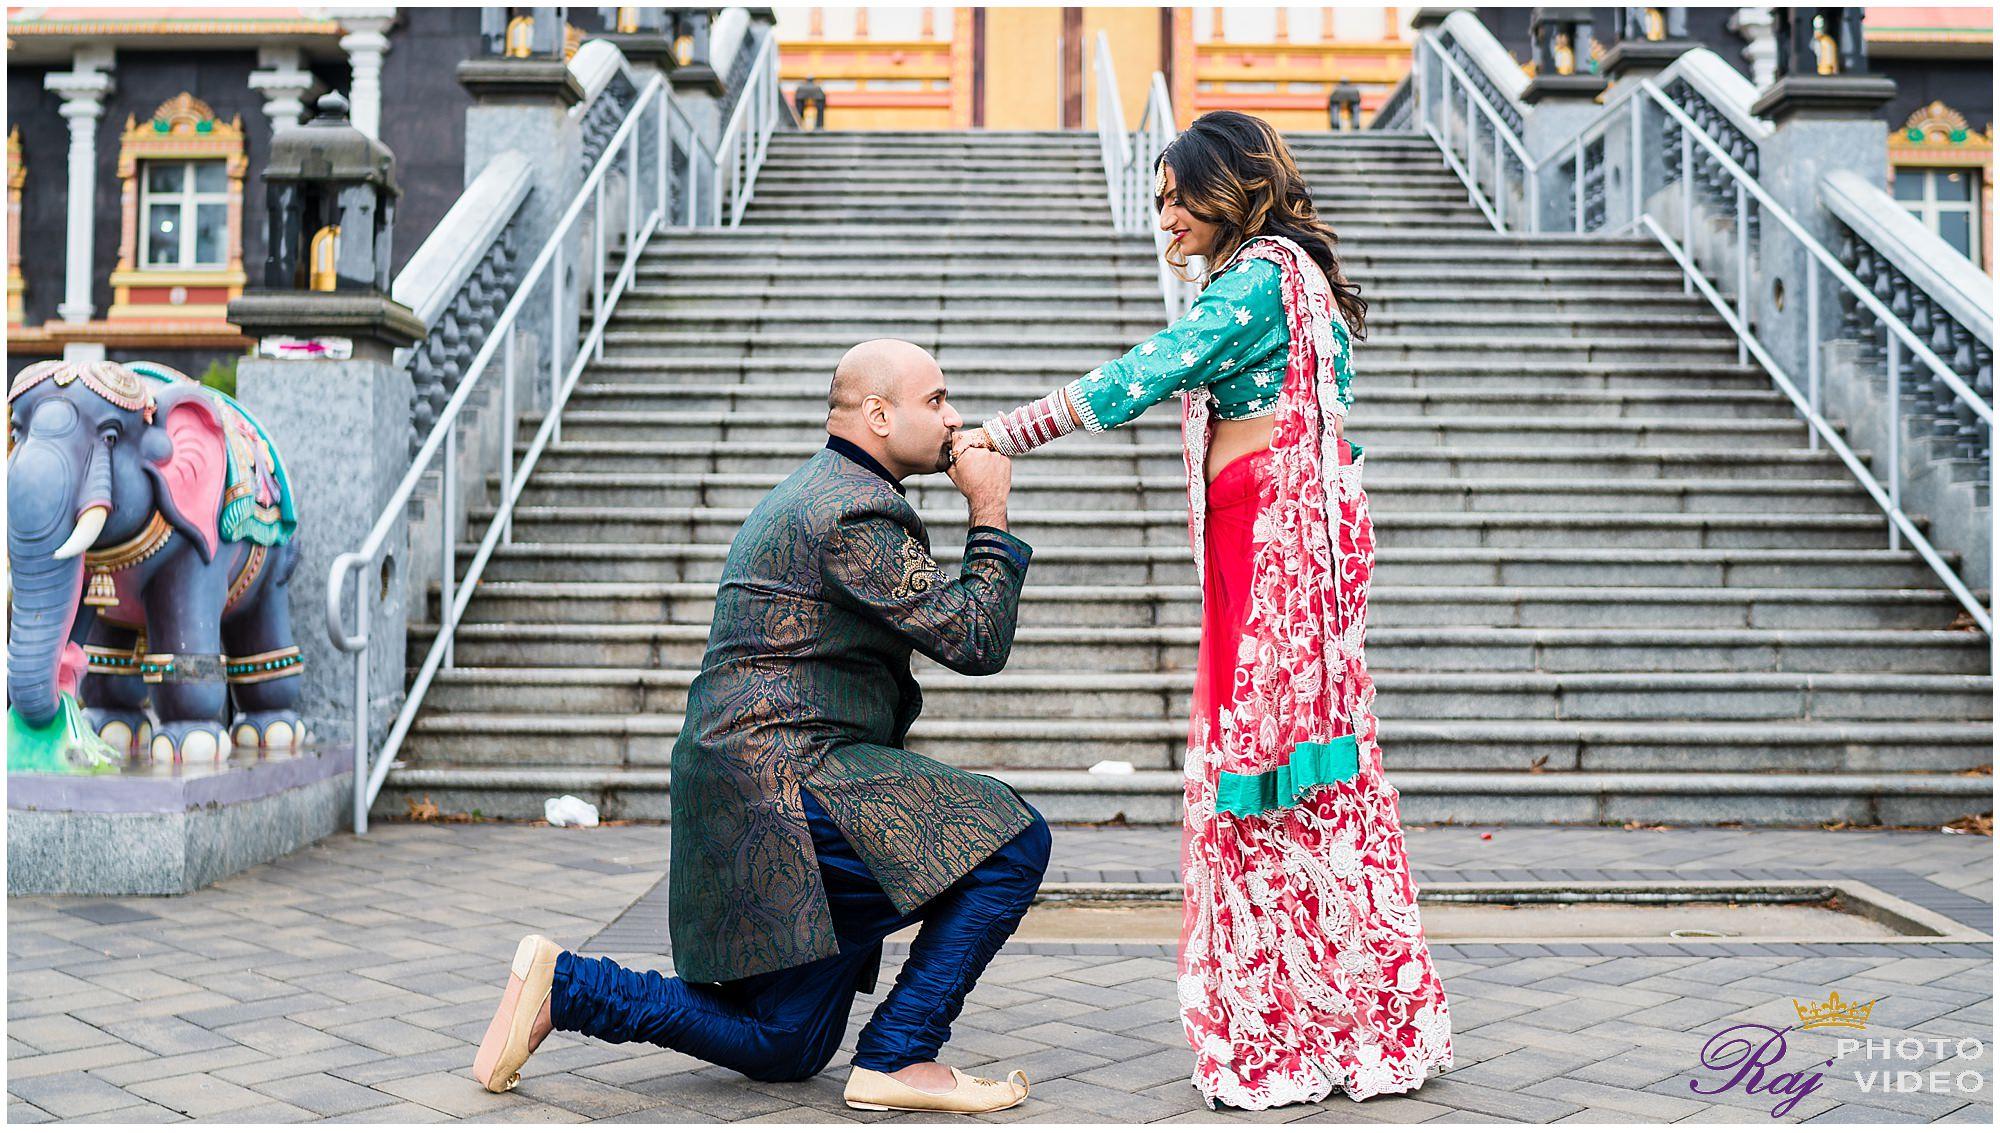 Sri-Guruvaayoorappan-Temple-Marlboro-NJ-Indian-Wedding-Chiyomi-Scott-00034.jpg